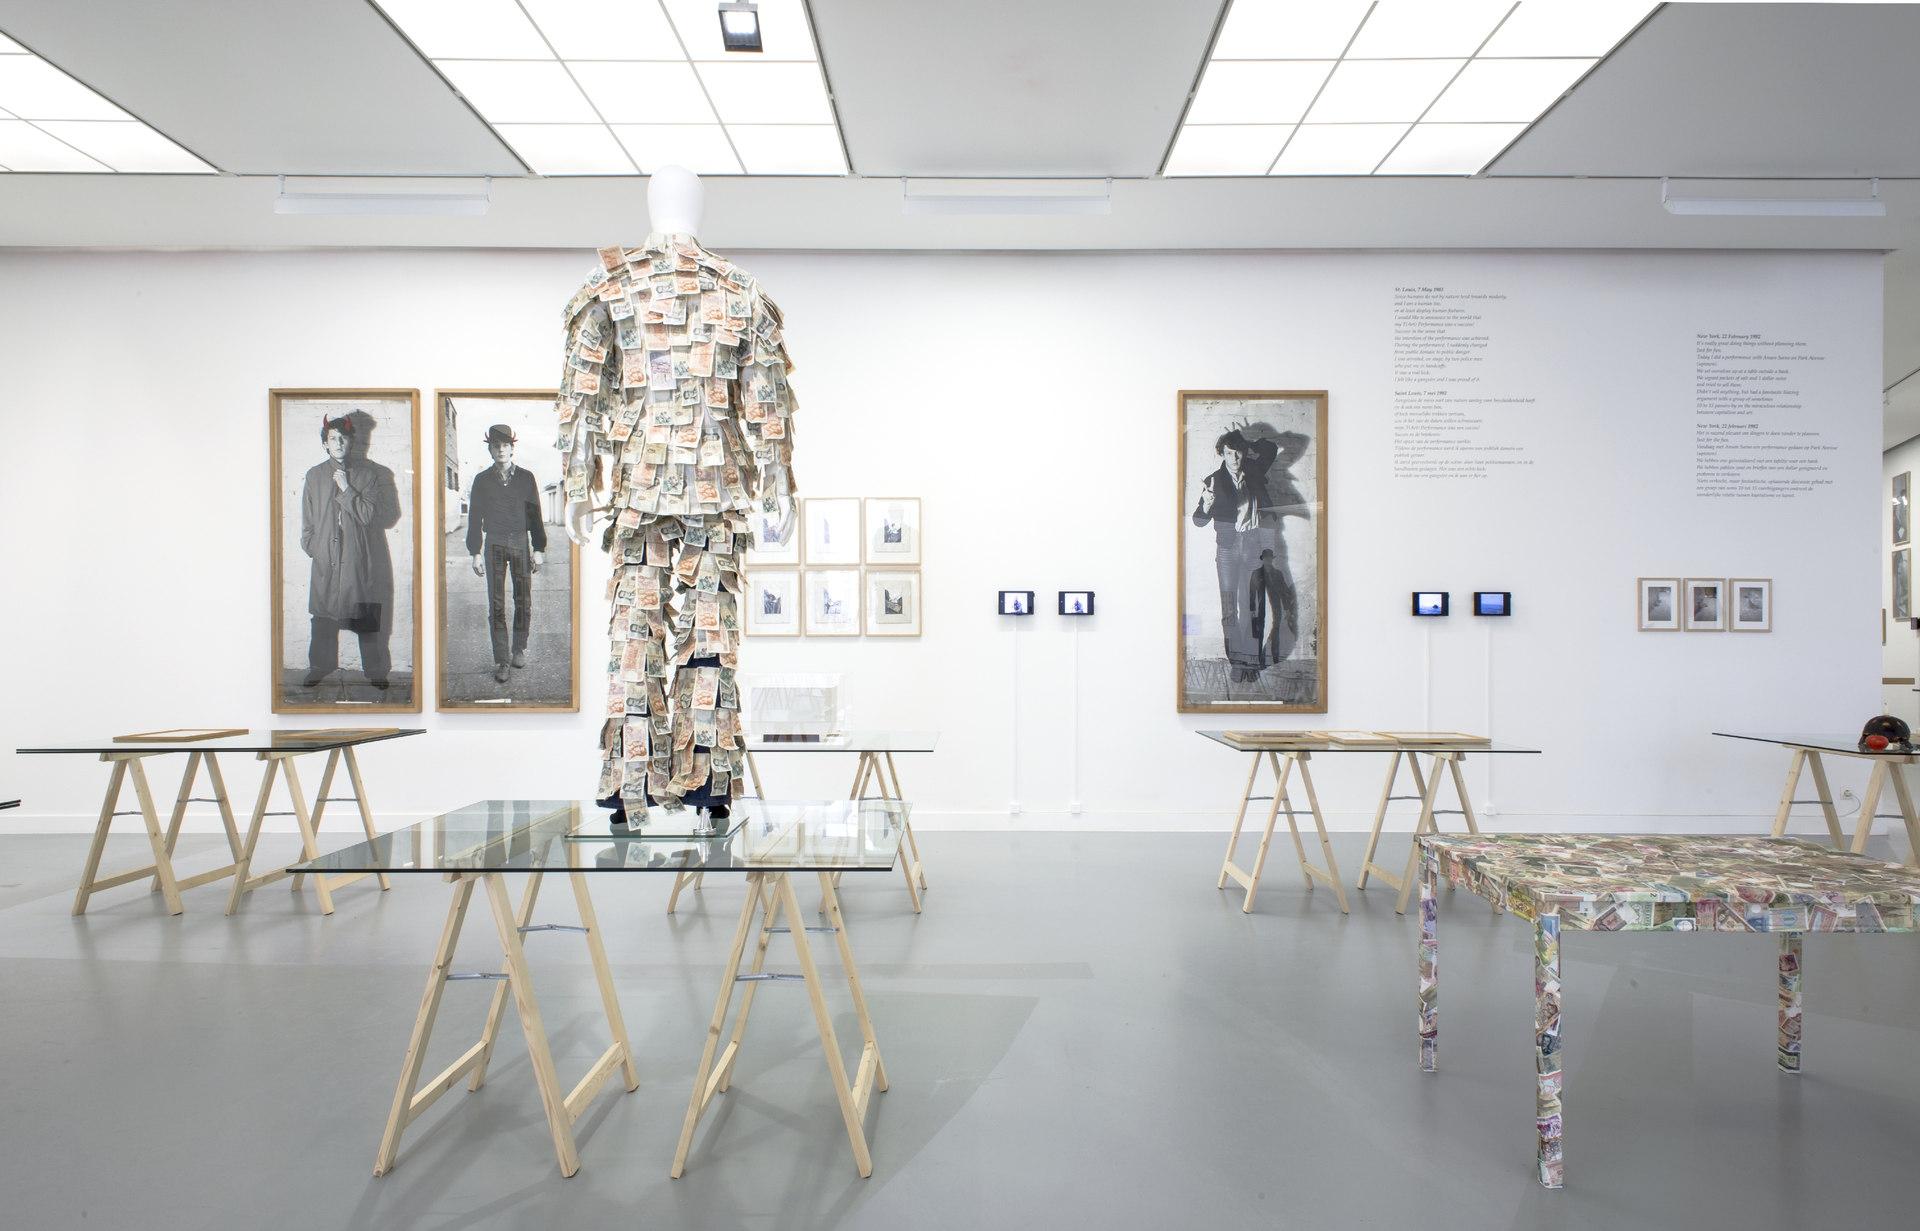 Jan_Fabre,_exhibition_view_M_HKA_2015_photo_M_HKAclinckx23